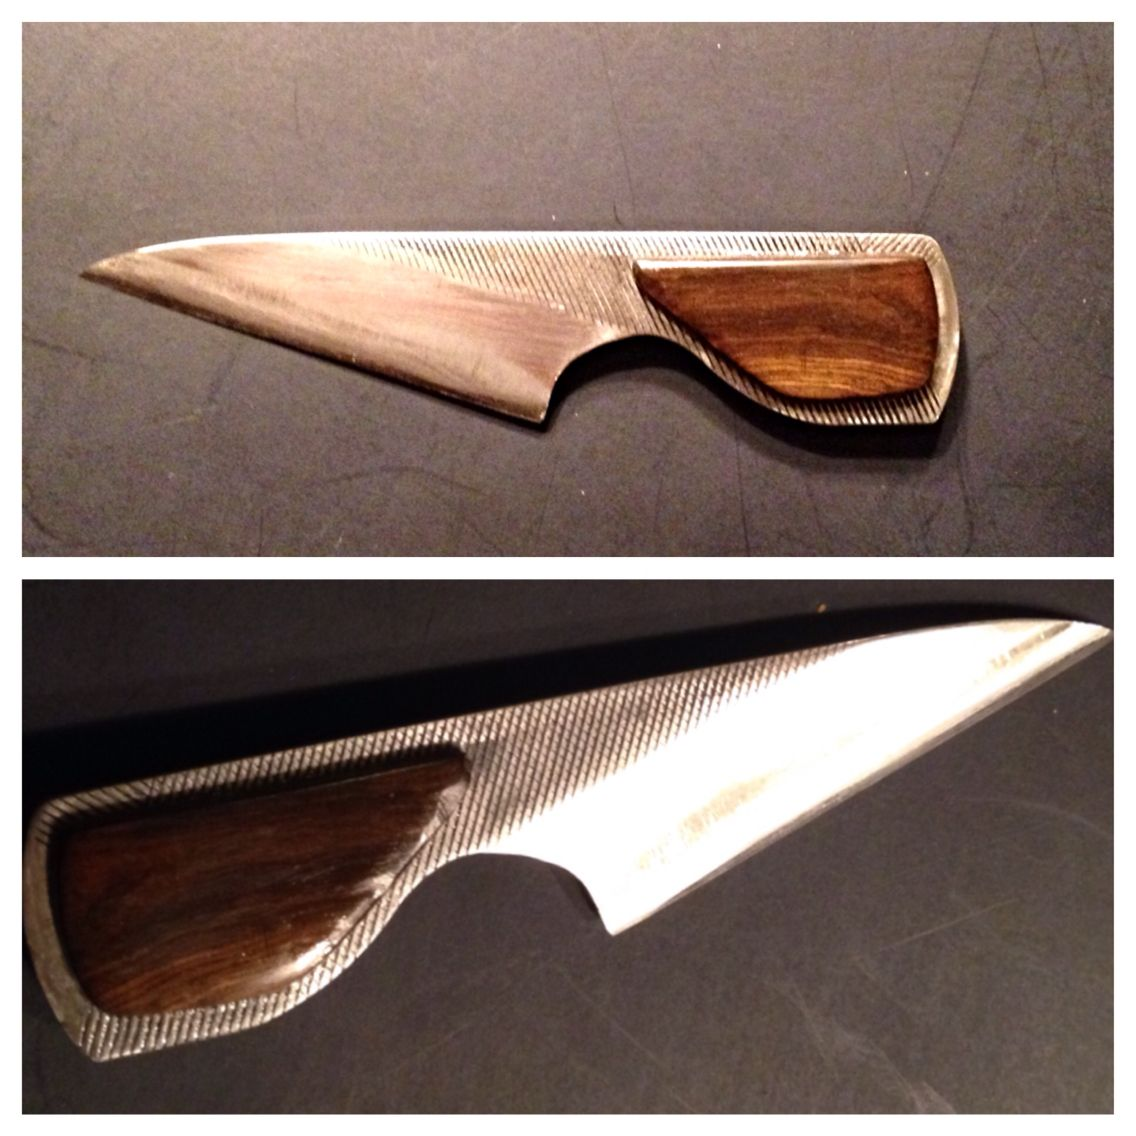 Knife Diy Knife File Knife Custom Knife Knife From